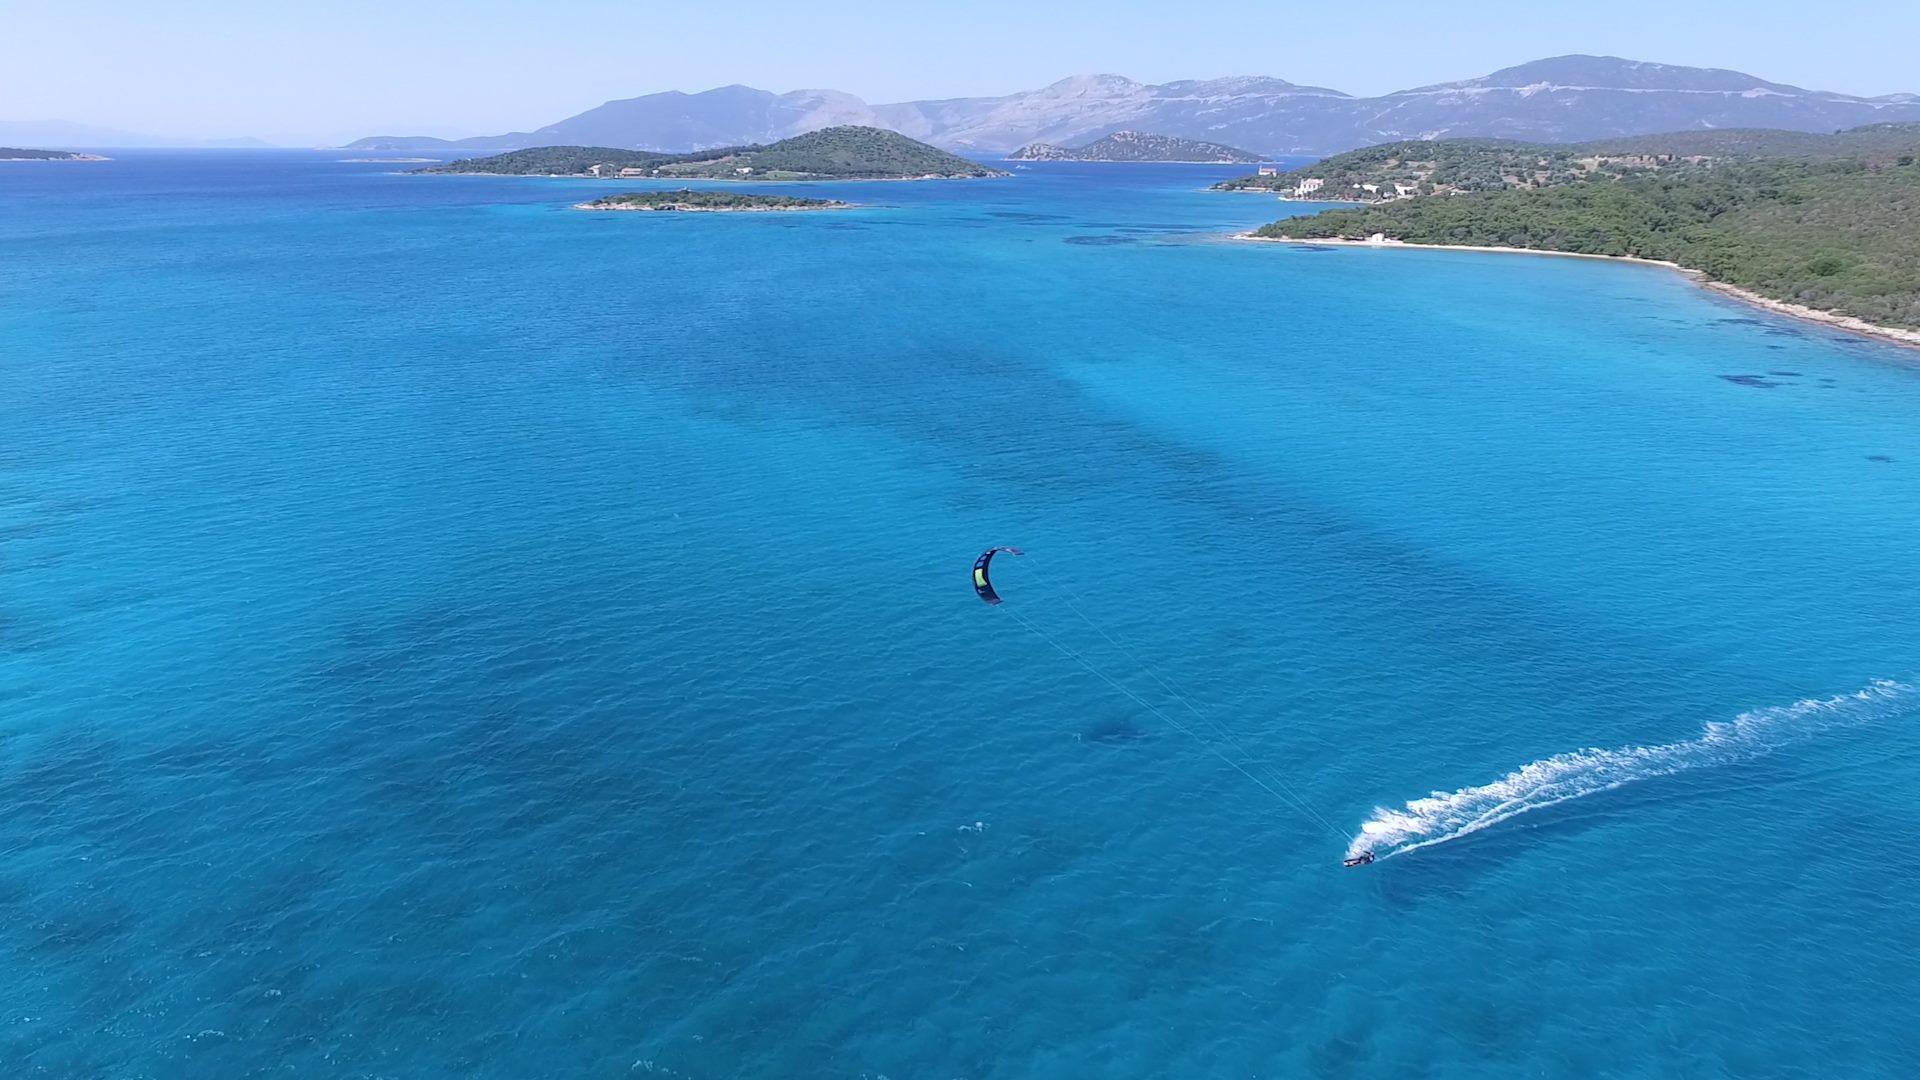 kitesurfing cruise Greece Evia Island